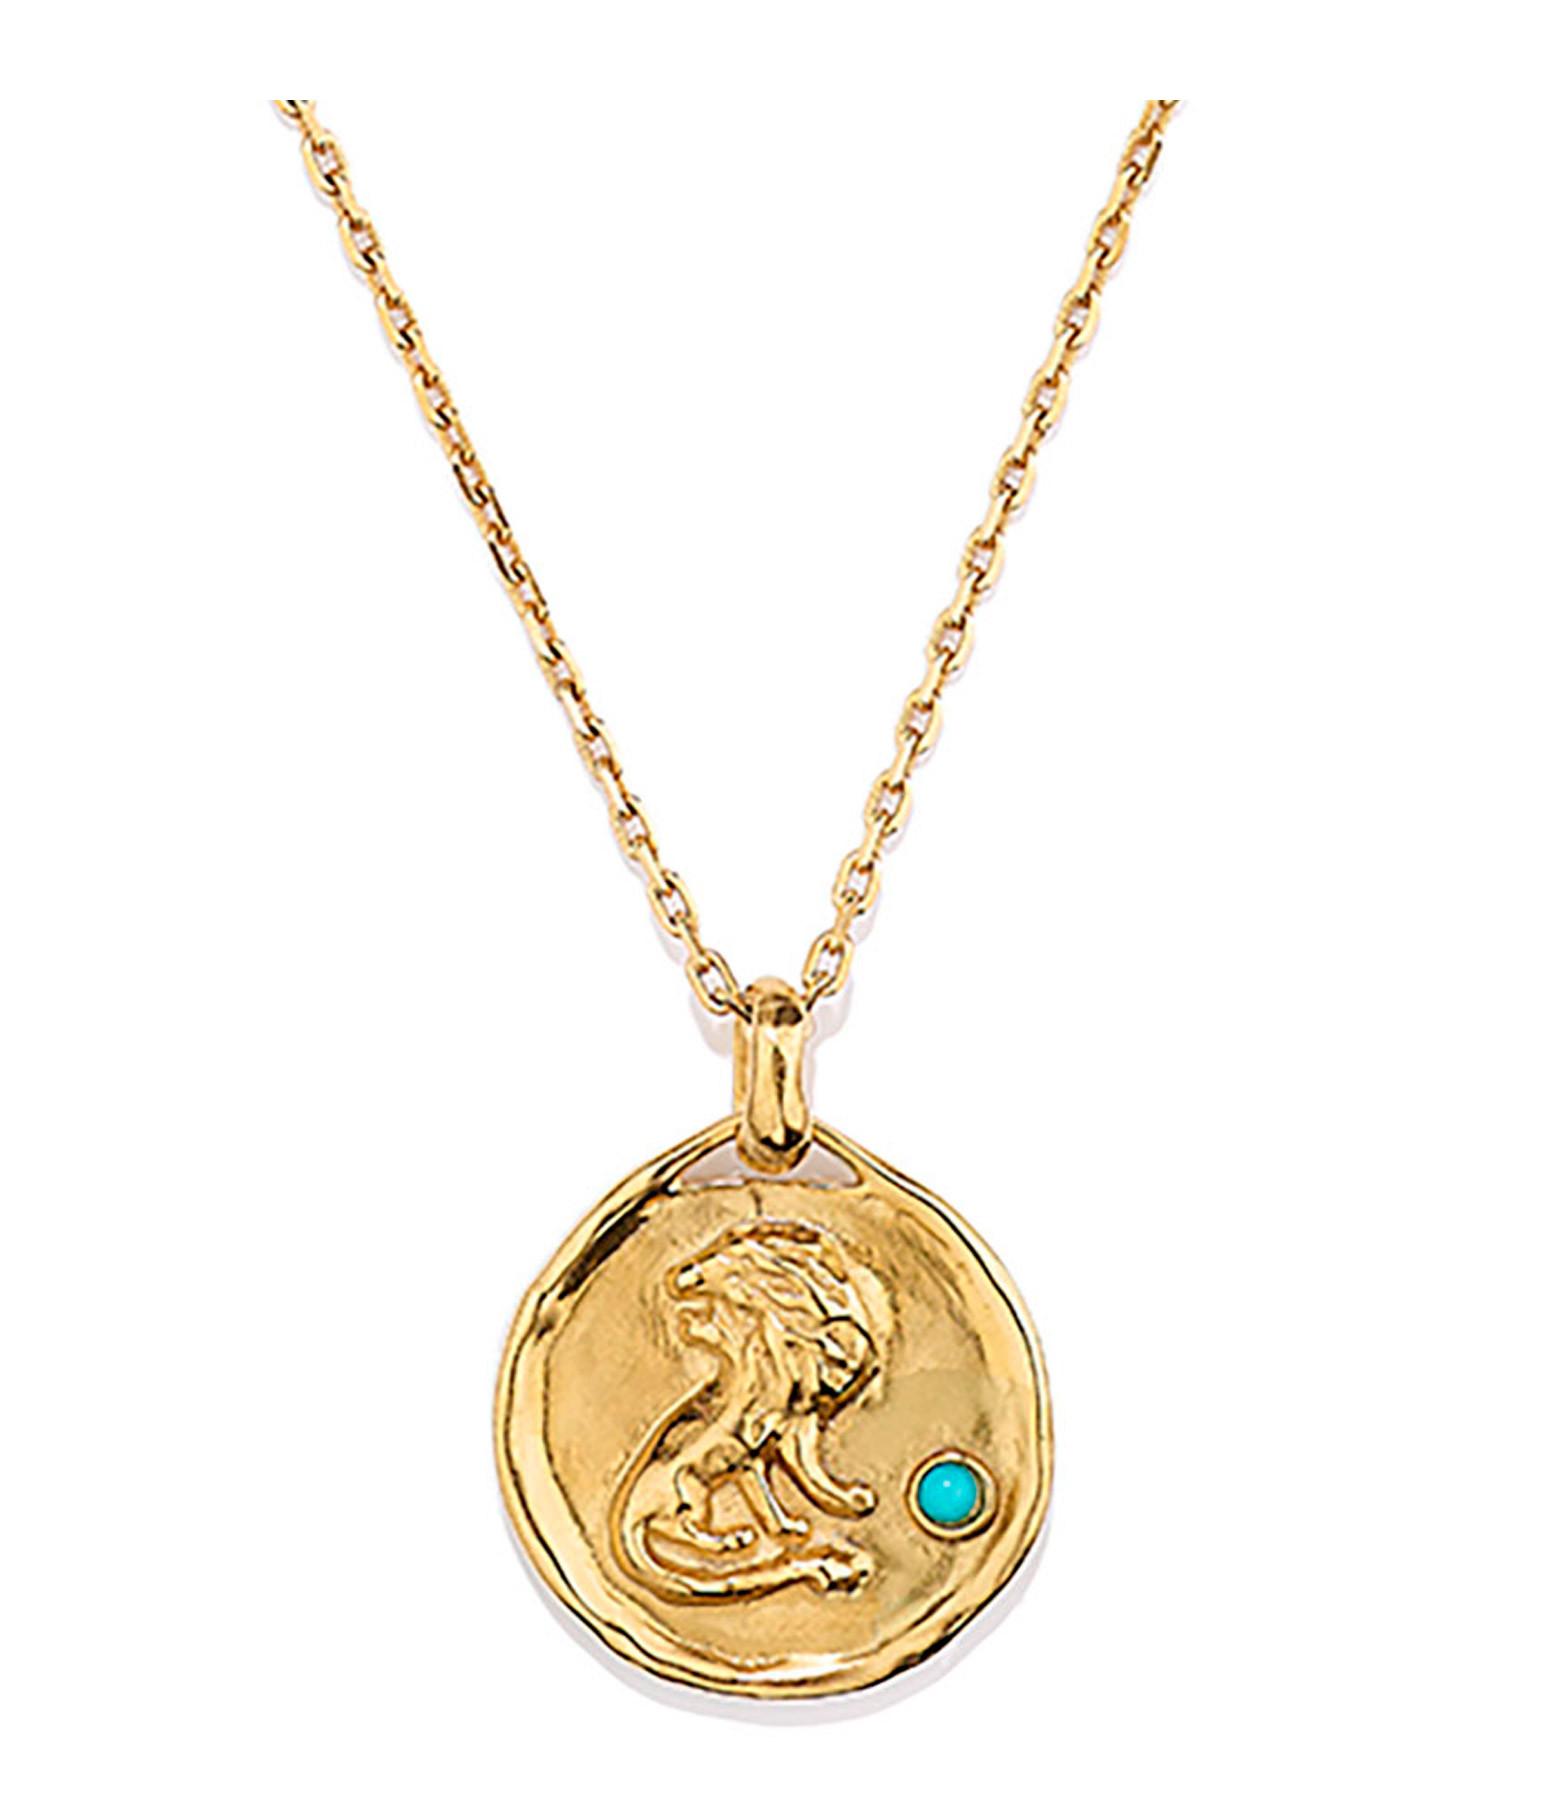 GOOSSENS - Collier Talisman Mini Astro Lion Turquoise Plaqué Or